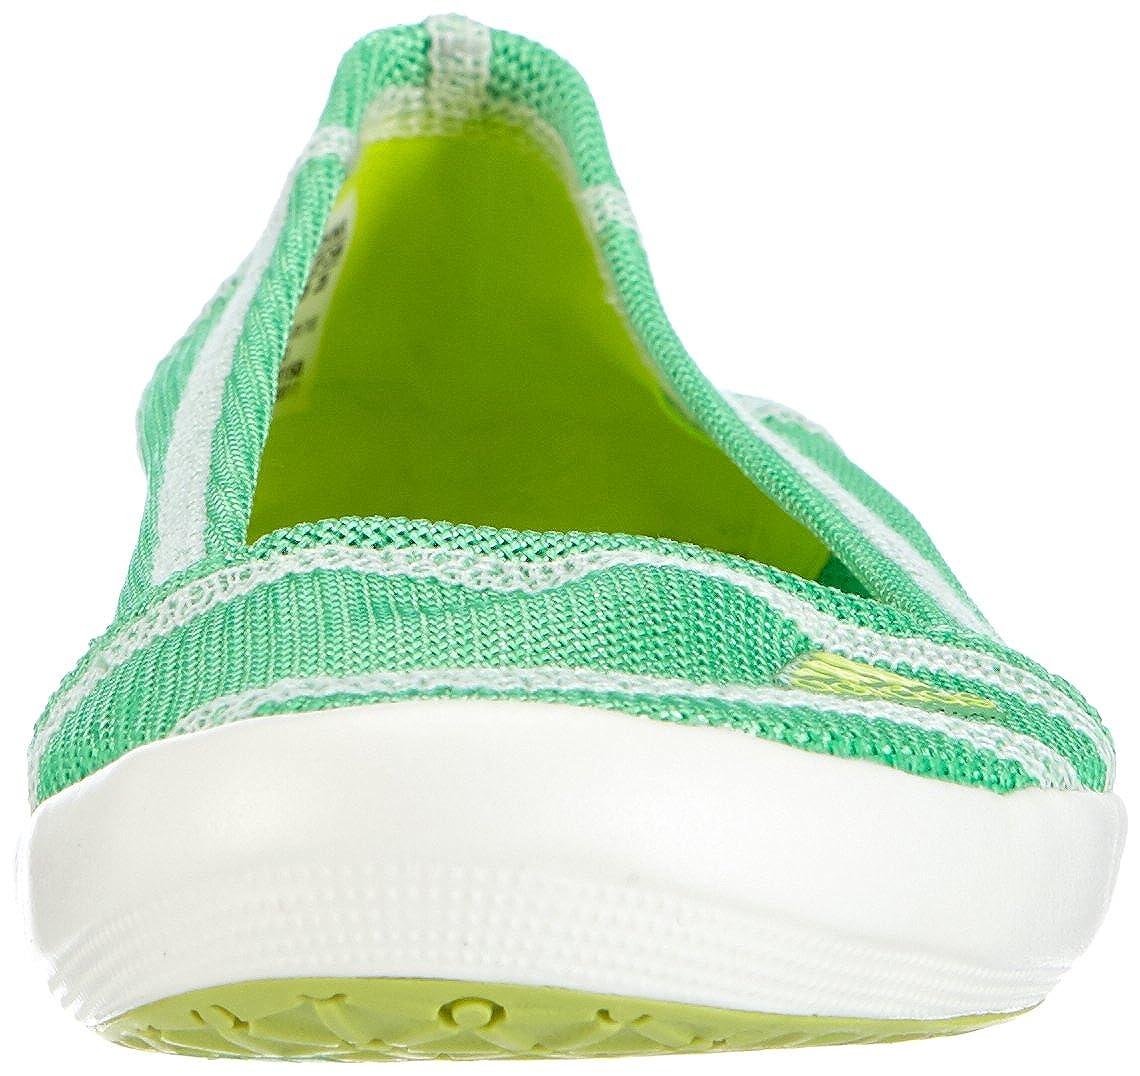 adidas barca scivola su donne eleganti scarpe / acqua scarpe